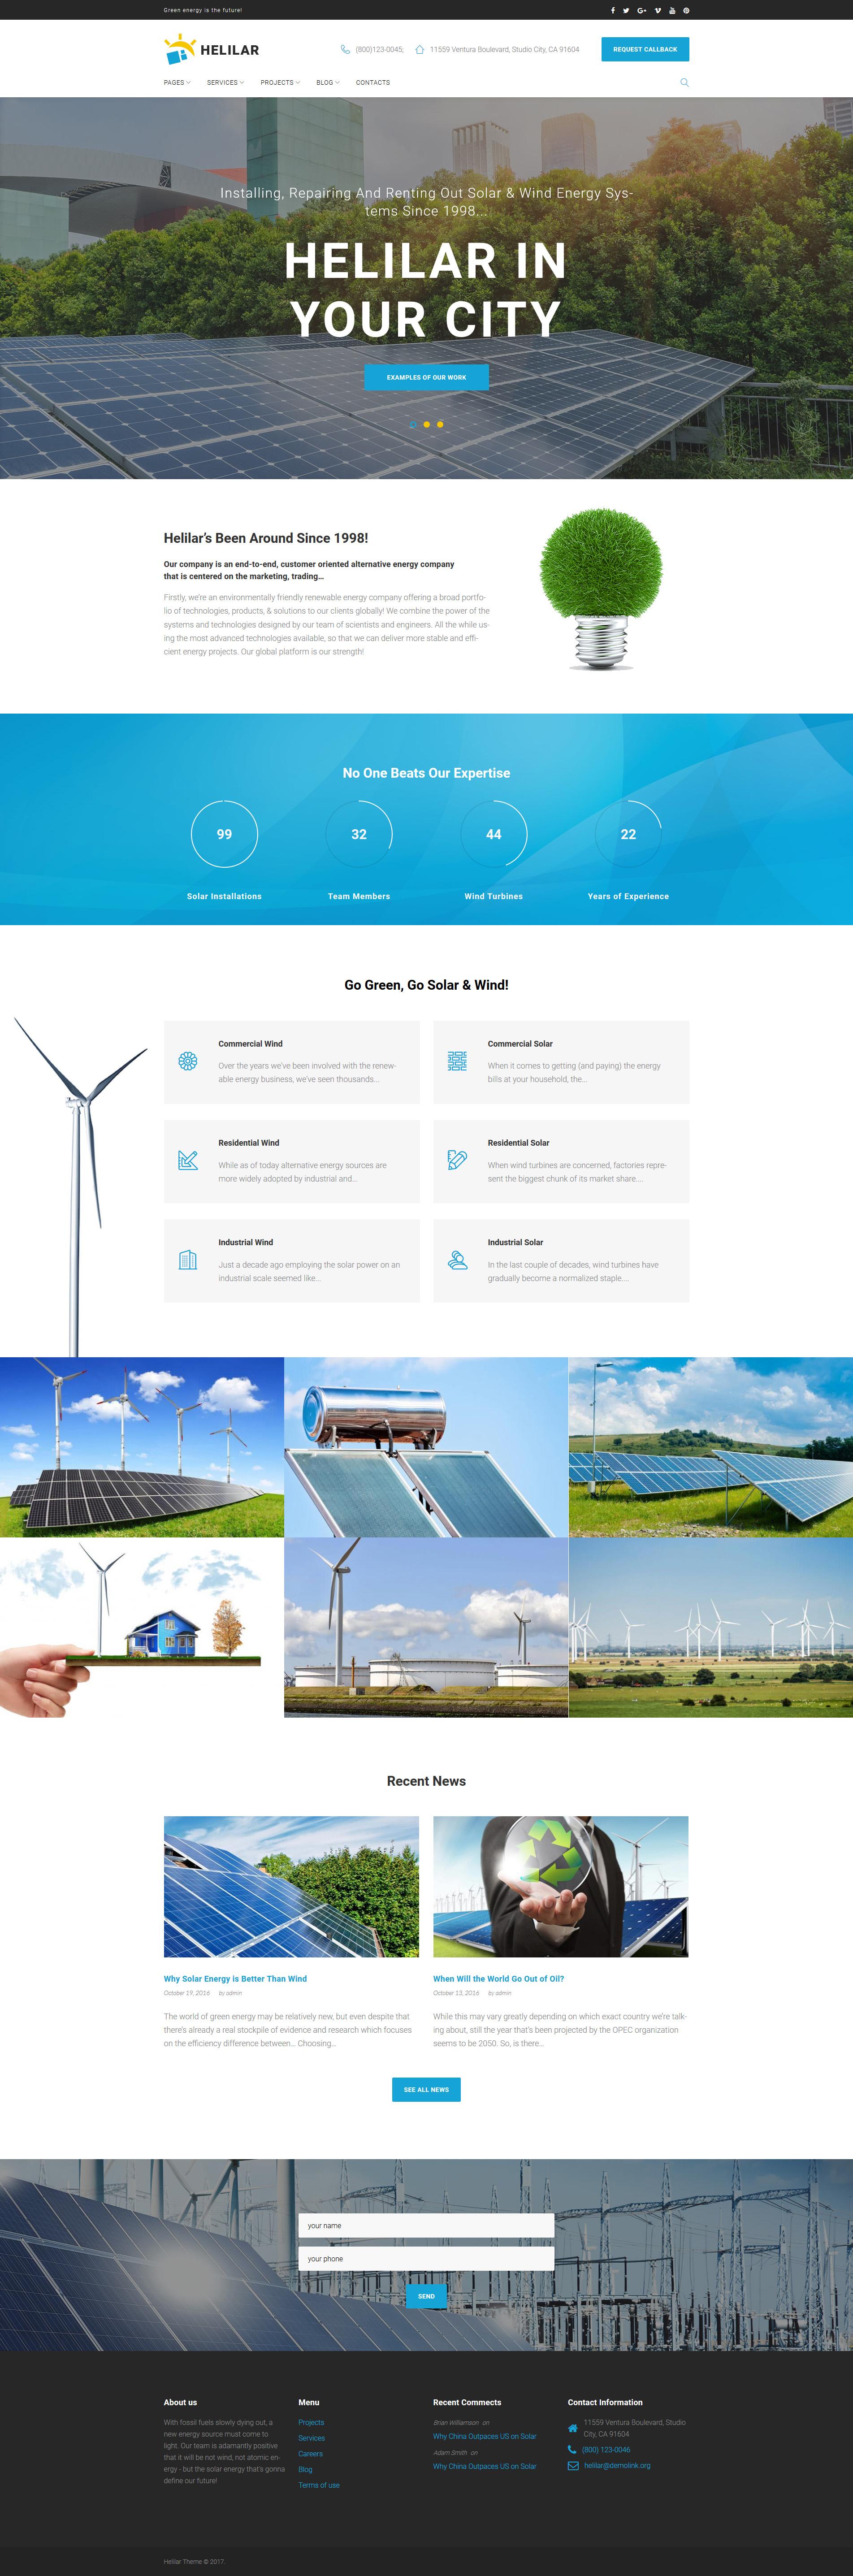 Helilar - Solar & Renewable Energy №63663 - скриншот